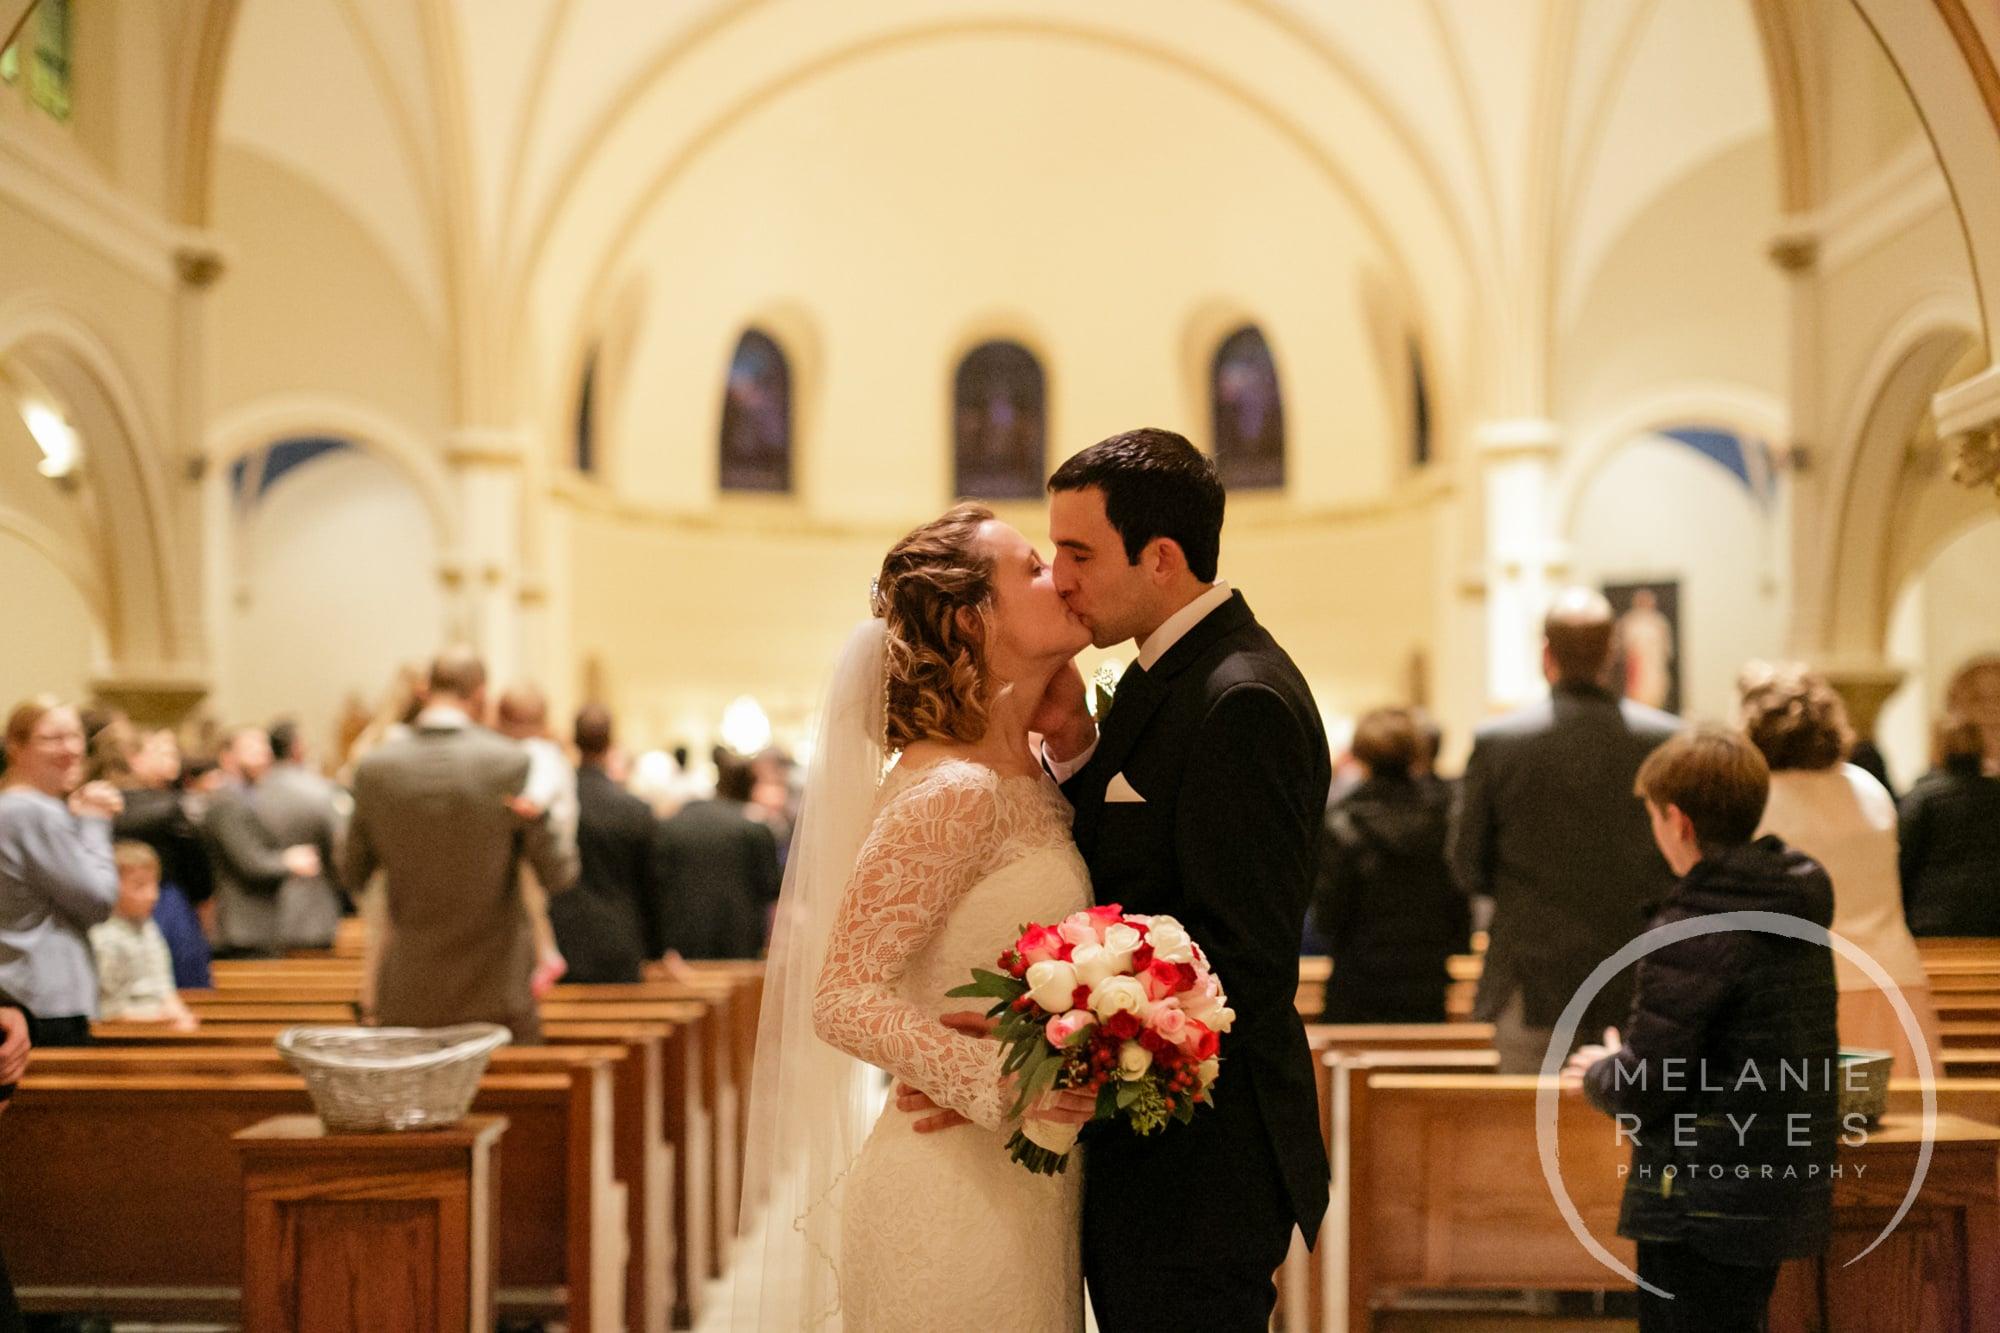 2015_ann_arbor_wedding_photographer_melaniereyes_034.JPG